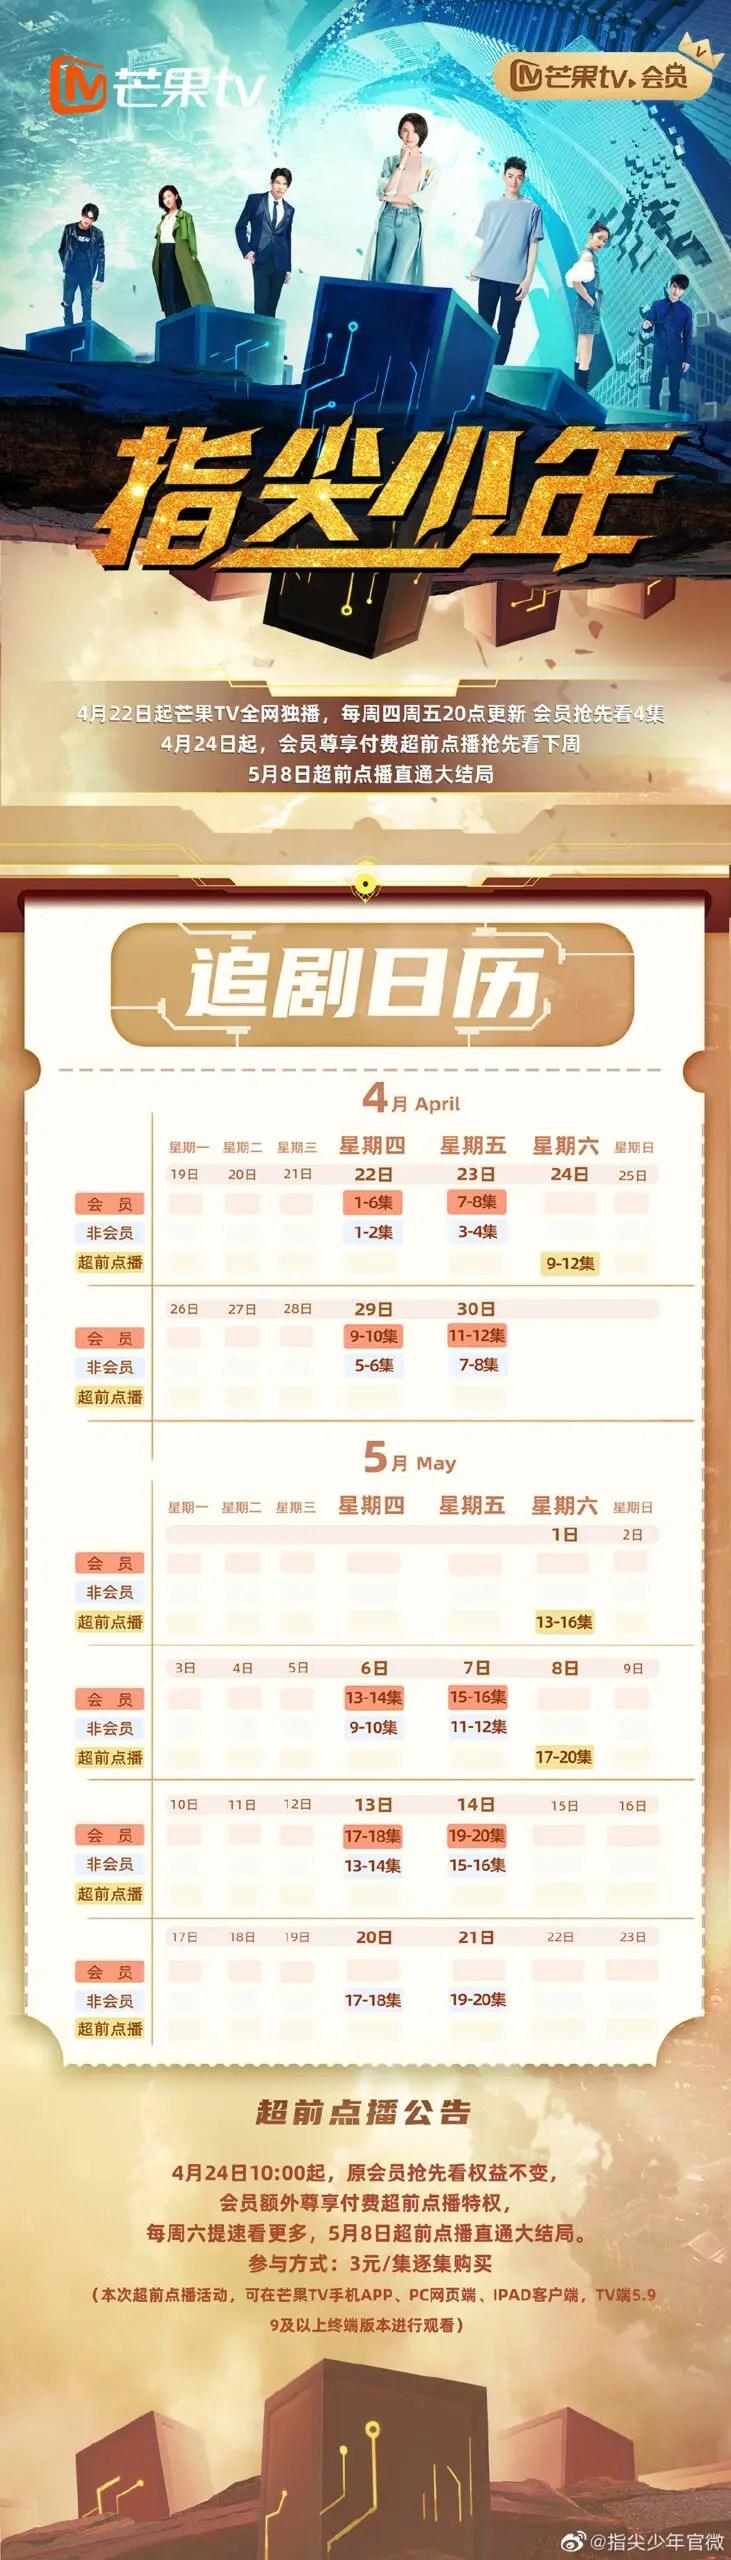 Fantasy Westward Journey Chinese Drama Airing Calendar